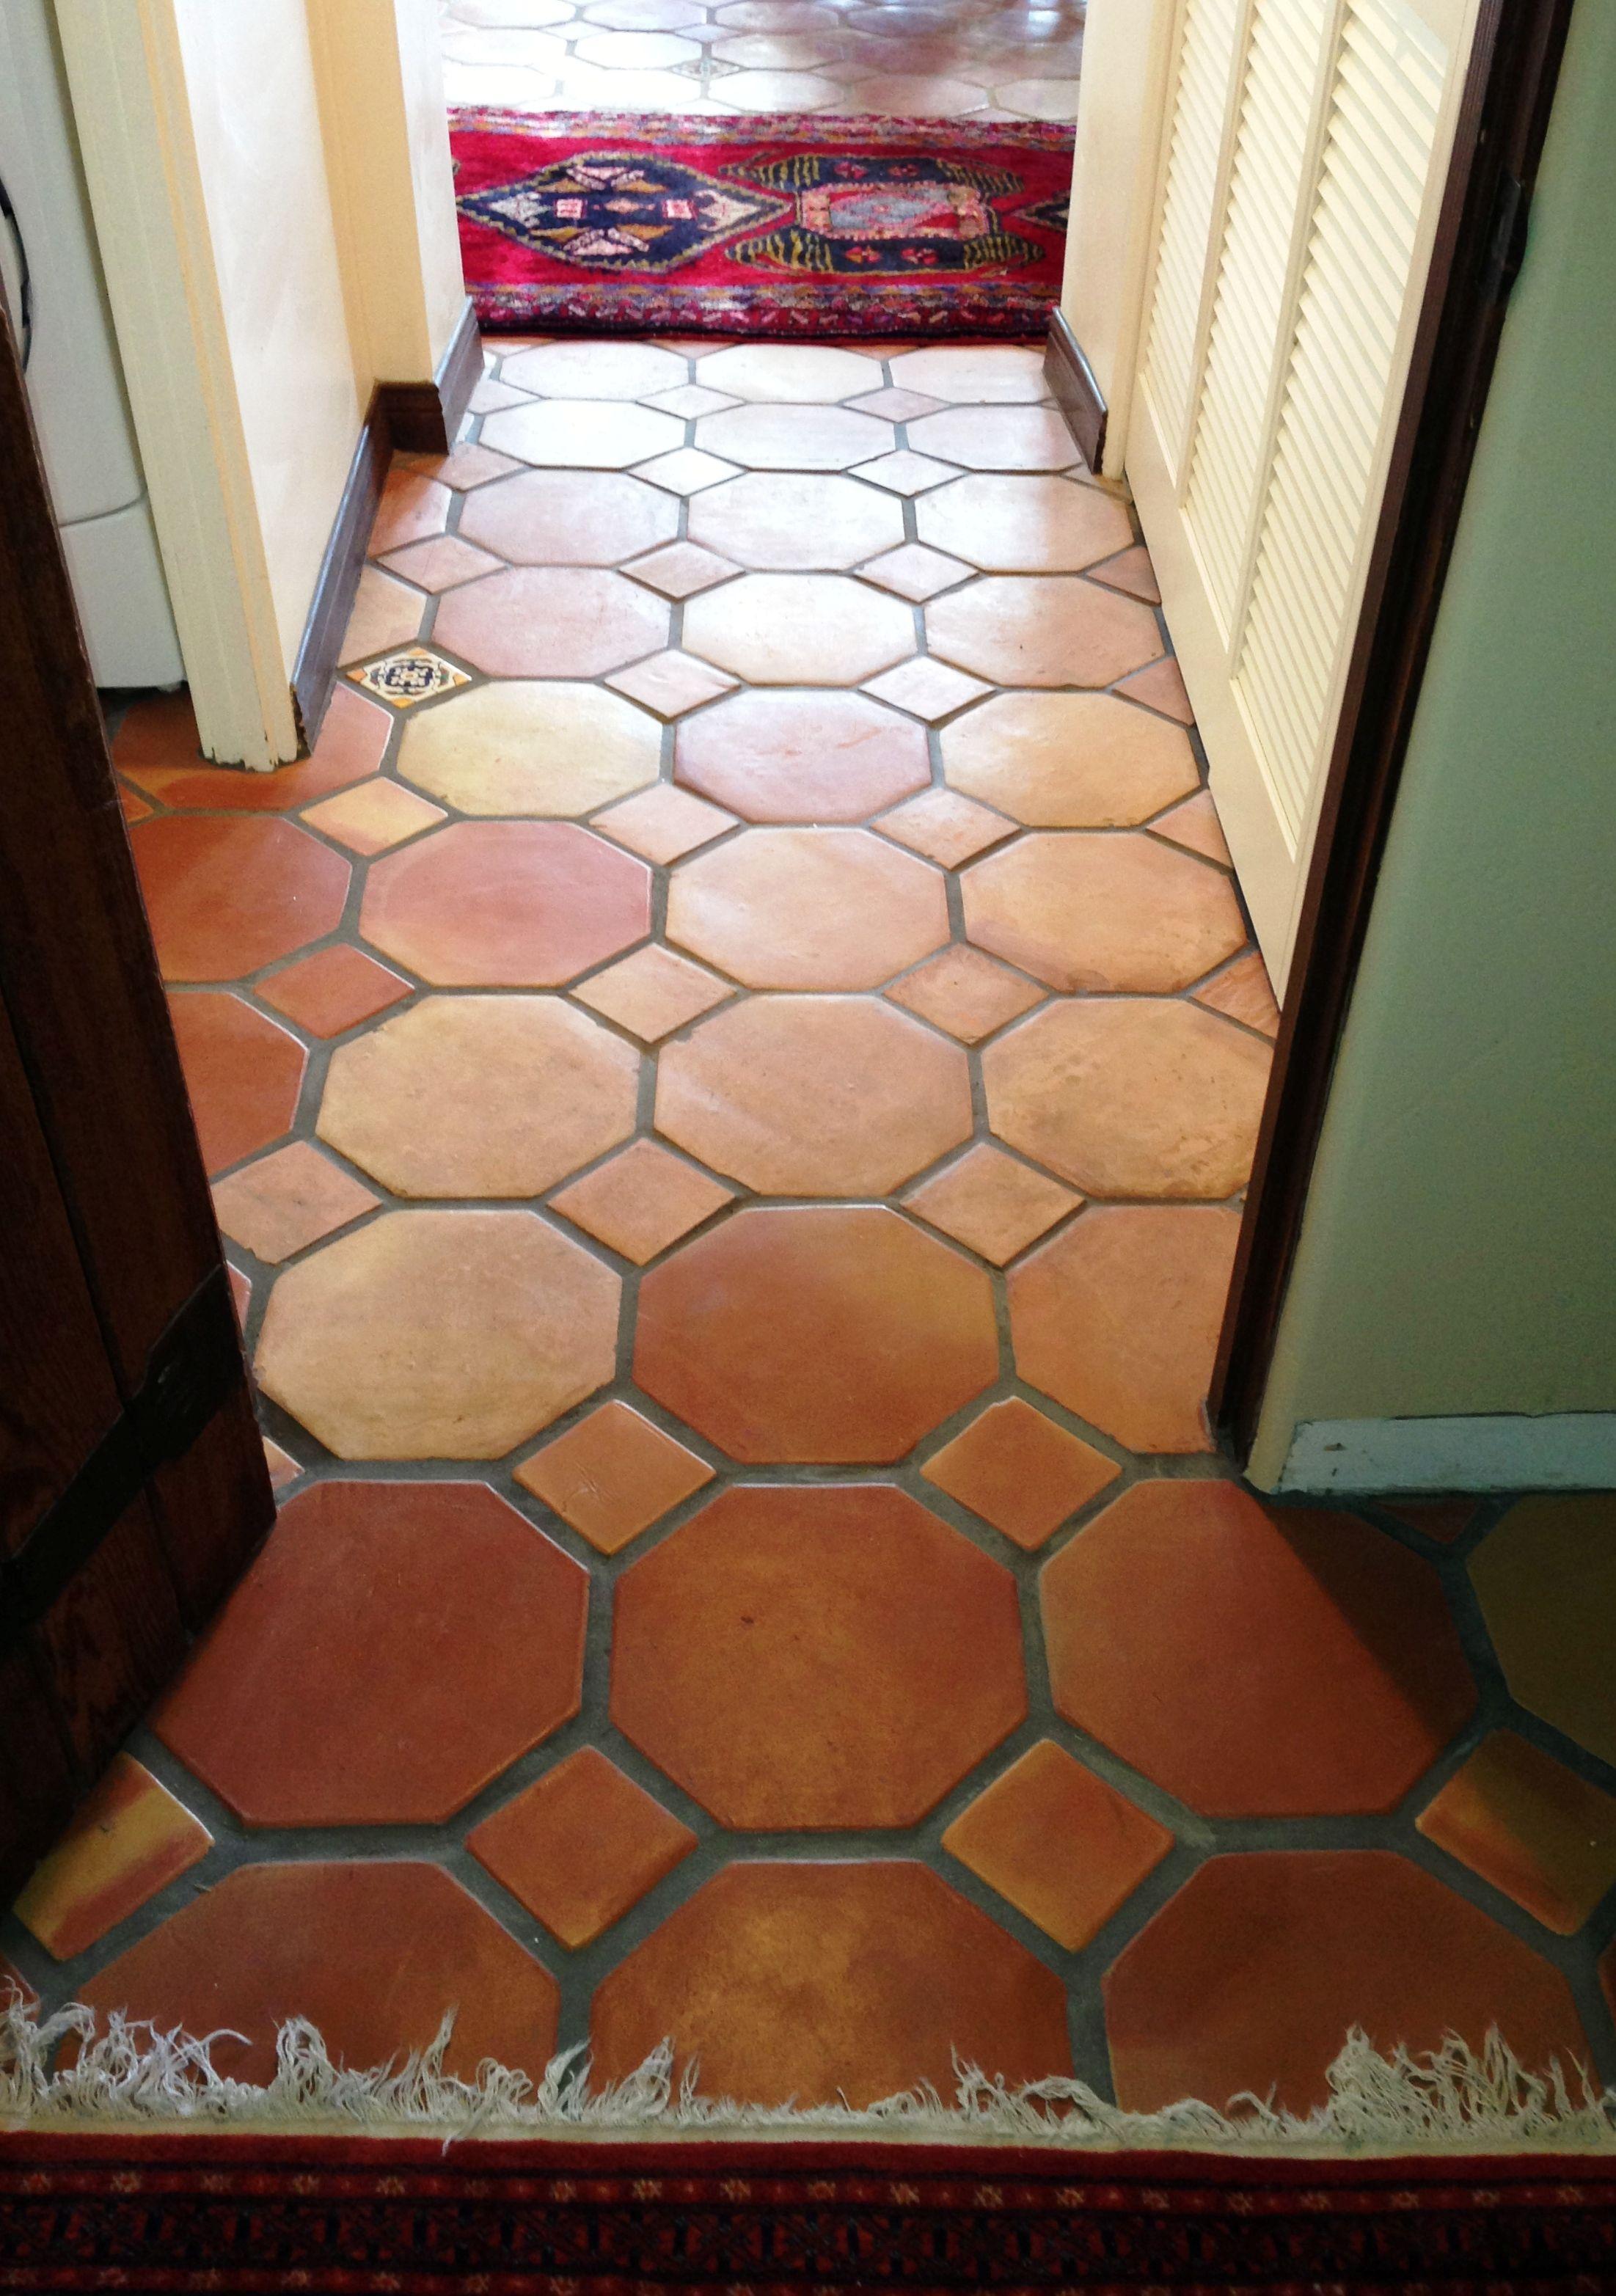 Blue 6x6 Tile Kids Bathroom With Mexican Tile Accent: 12x12 Octagon Pattern Saltillo Terra Cotta Floor Tiles